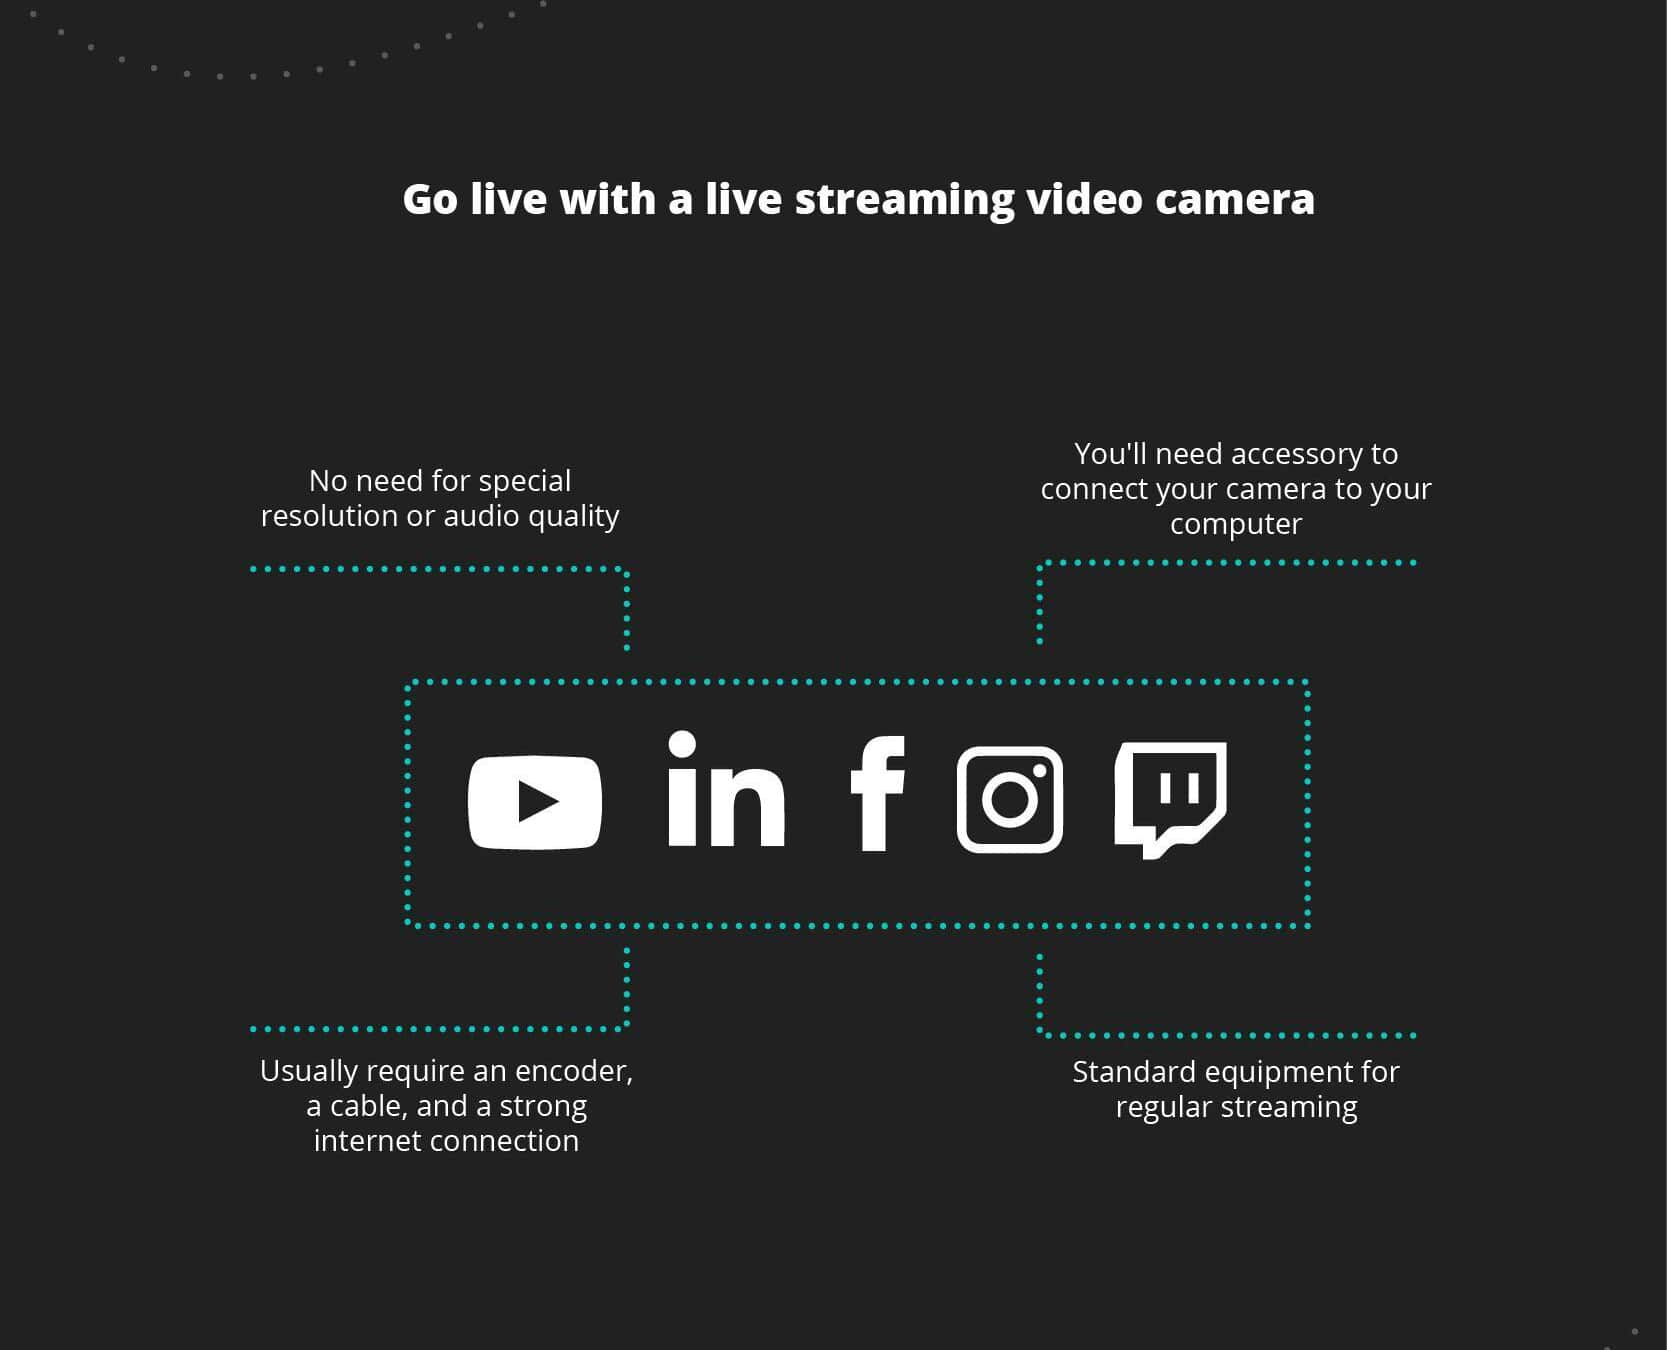 Choose a streaming platform